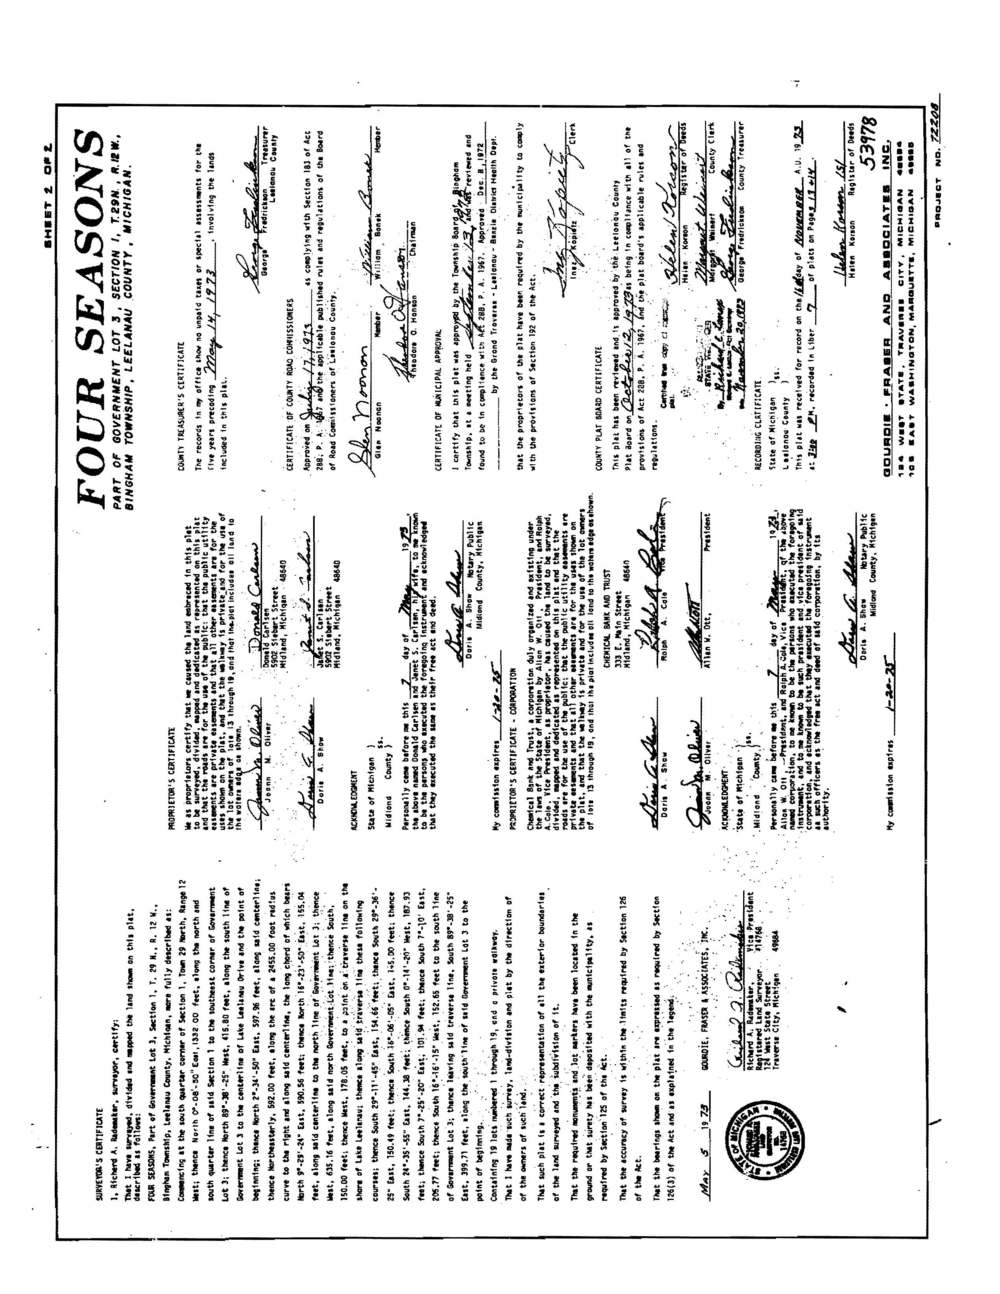 2736 S Lake Leelanau Dr, South Lake Leelanau Waterfront for sale by Oltersdorf Realty LLC - Marketing Packet (11).jpg